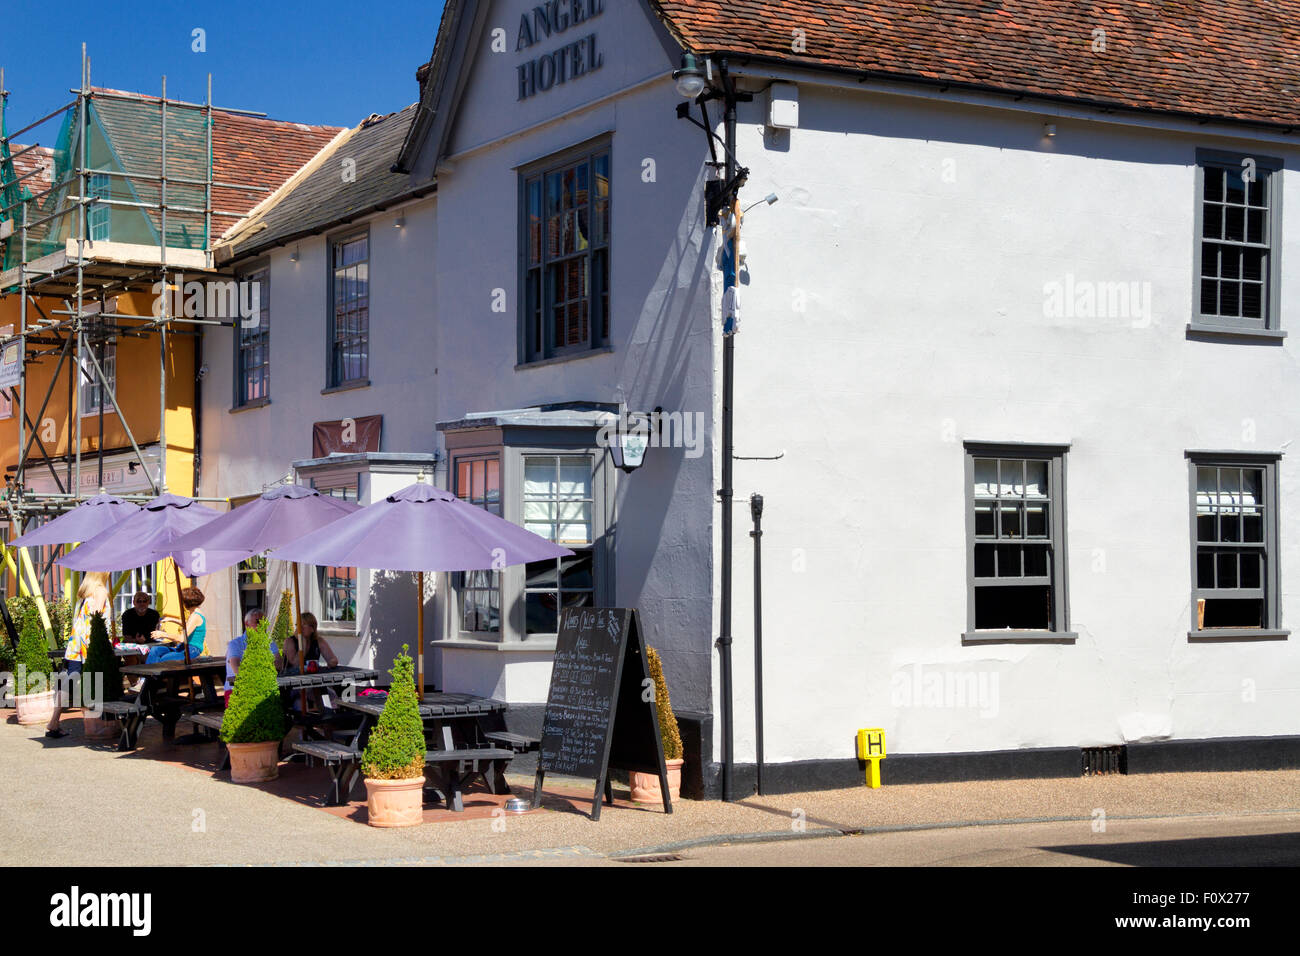 The Angel Hotel, Market Place, Lavenham, Suffolk, UK Stock Photo